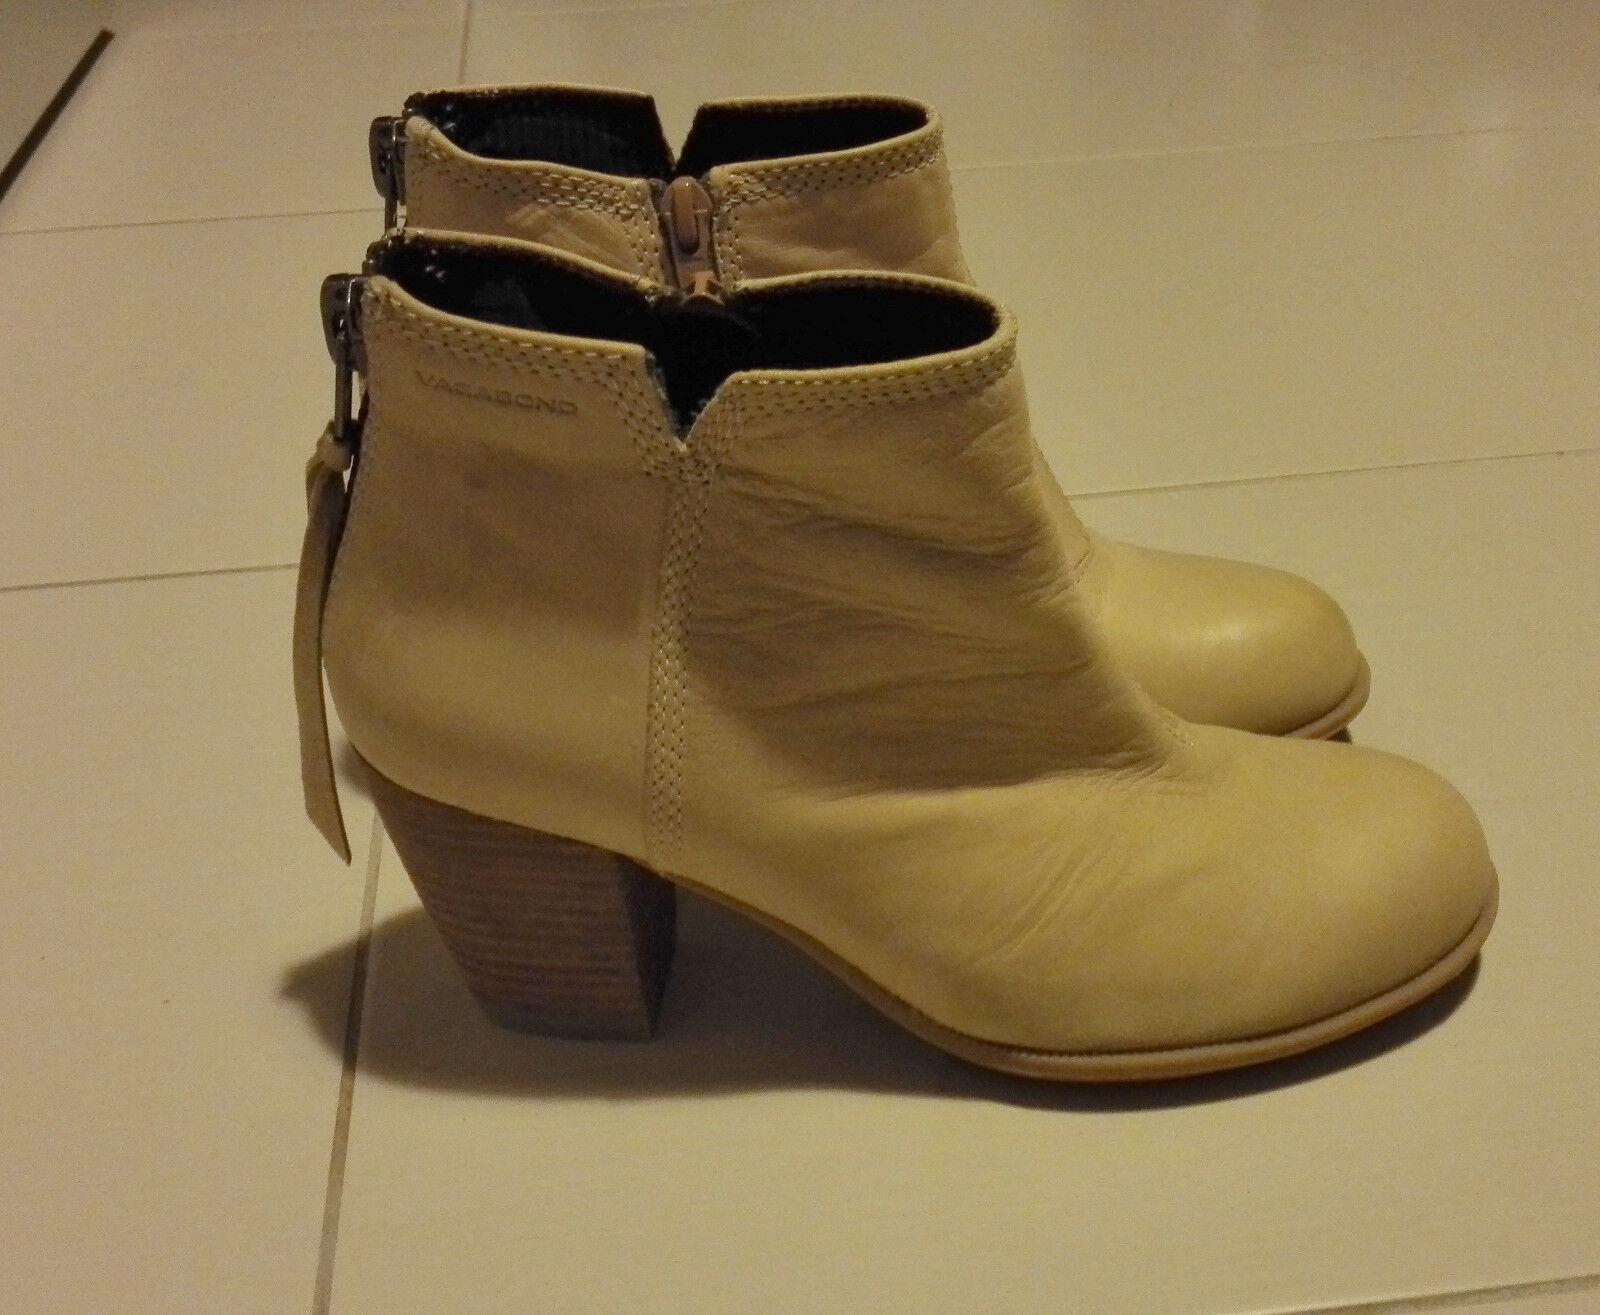 Vagabond Pistol Cuban Heel Western Ankle Boots Stiefeletten Stiefel Booties